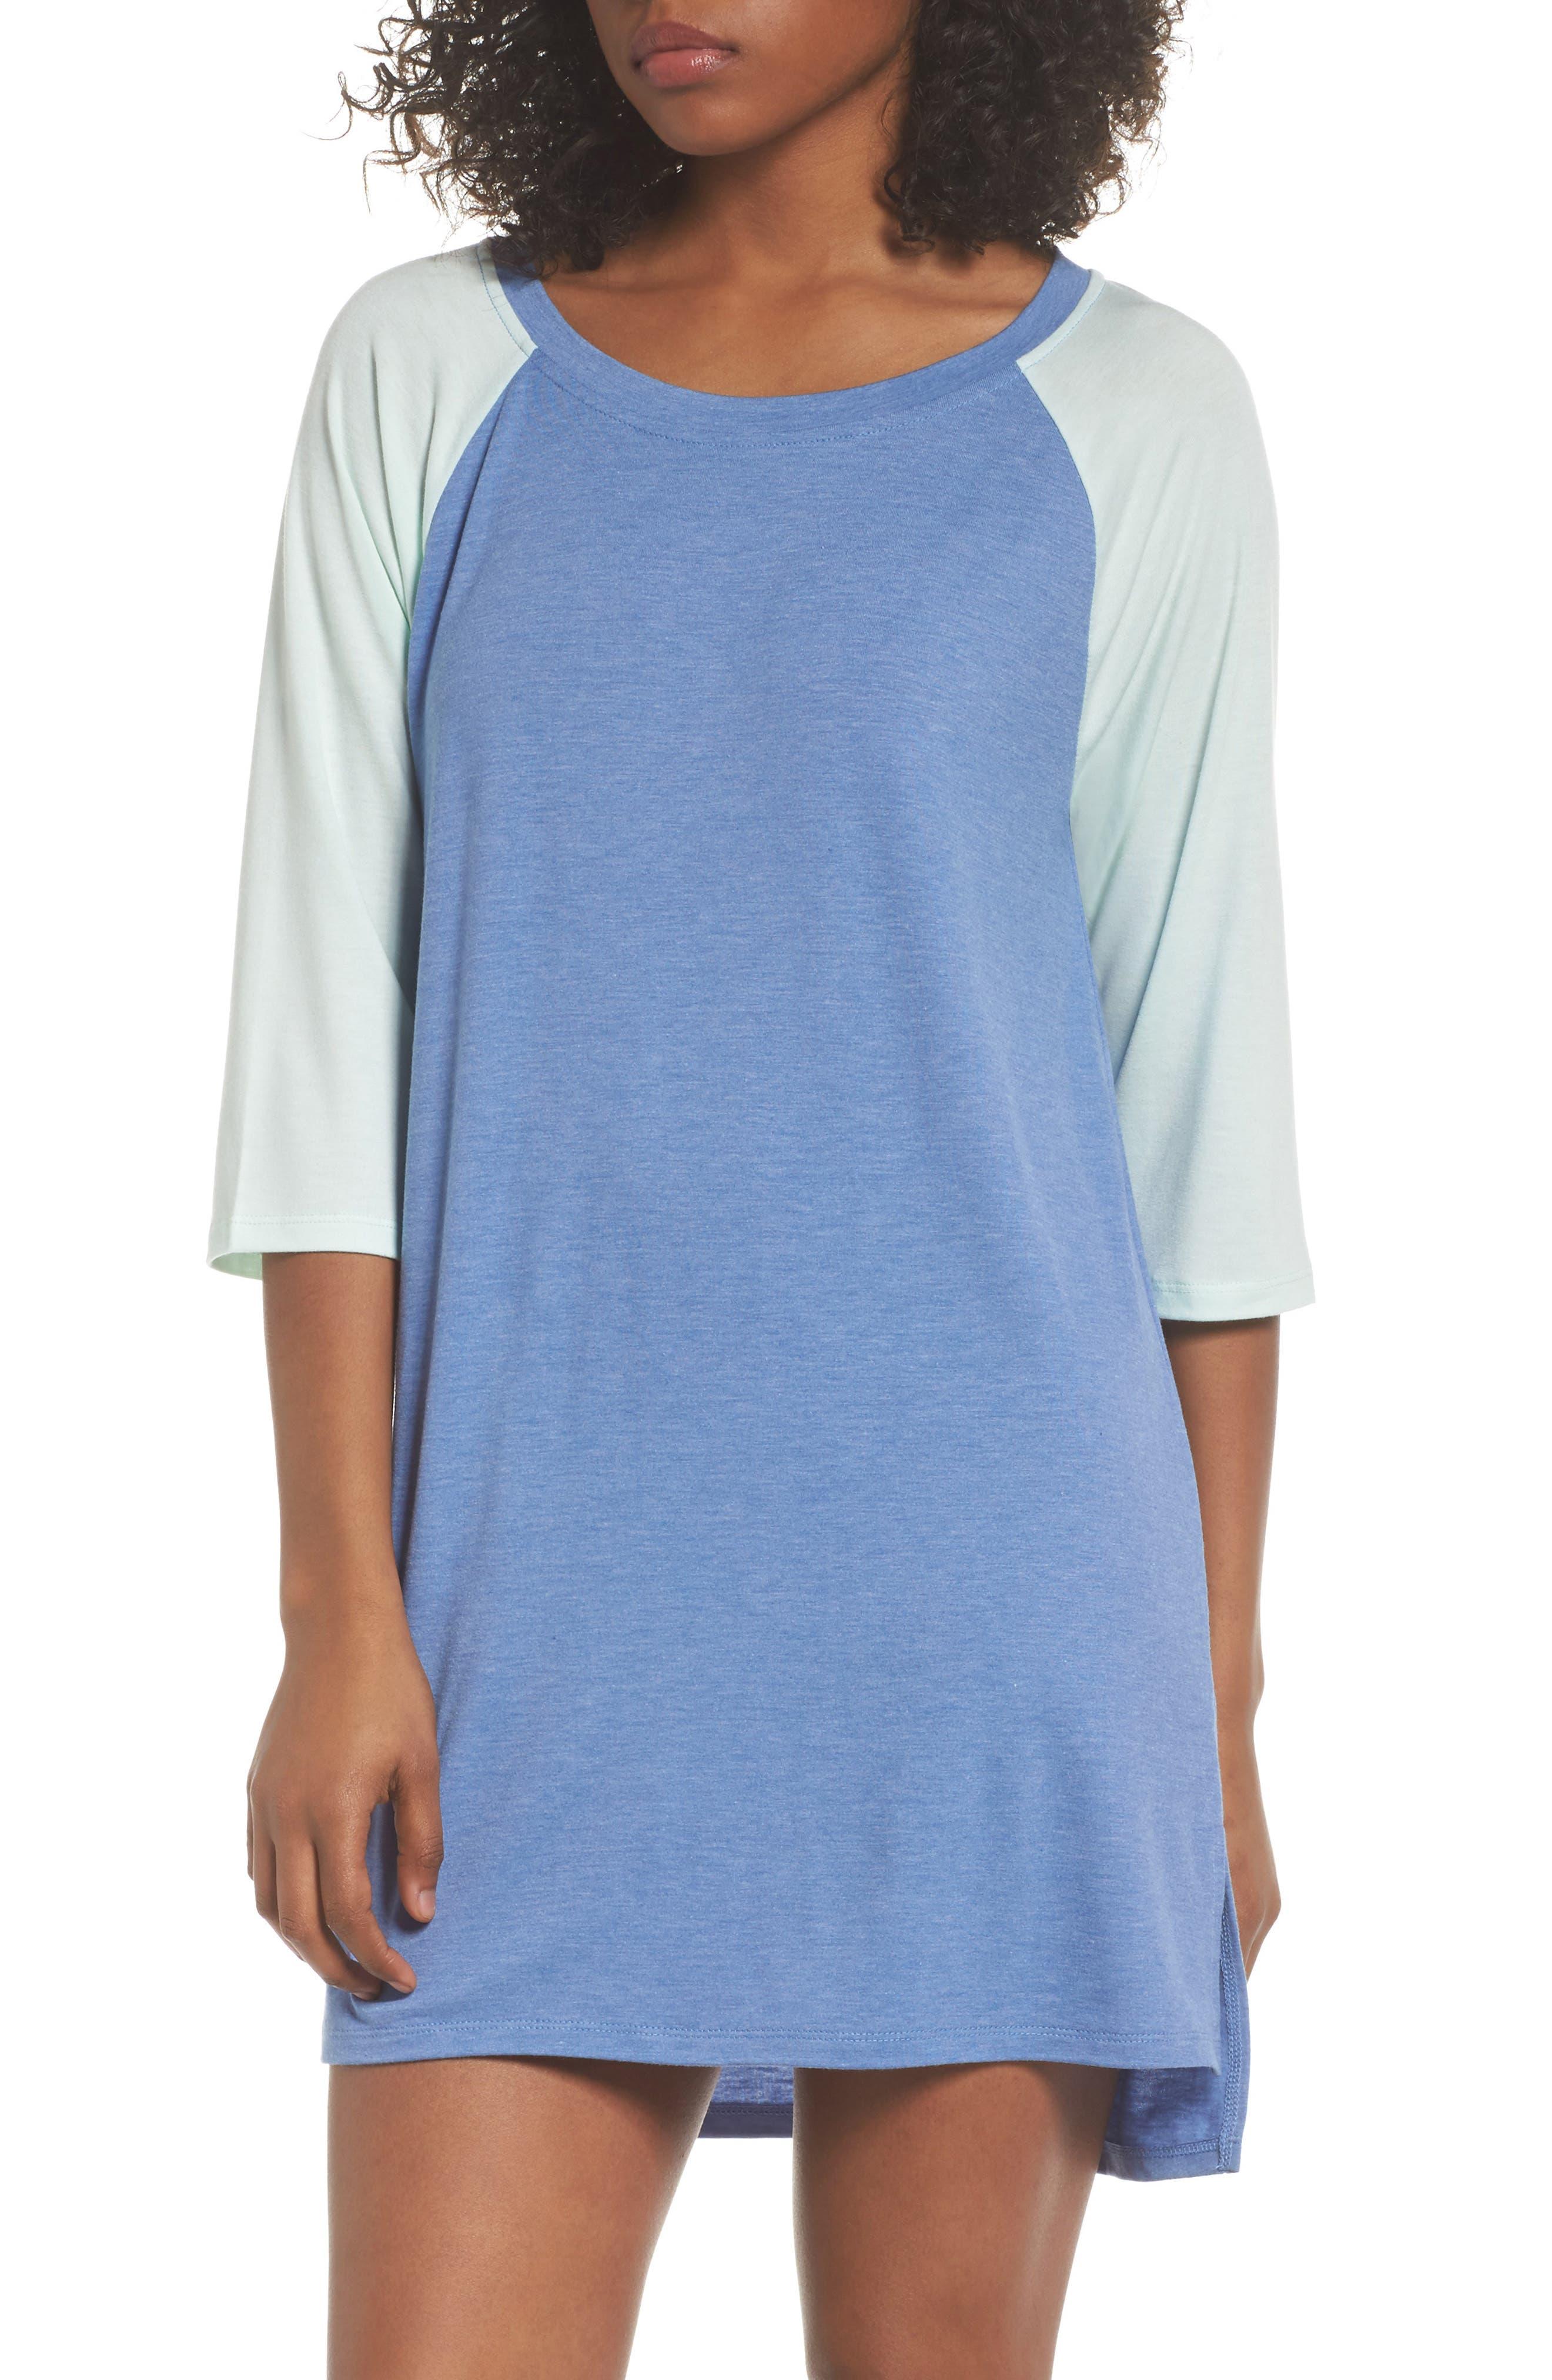 Main Image - Honeydew All American Sleep Shirt (2 for $60)